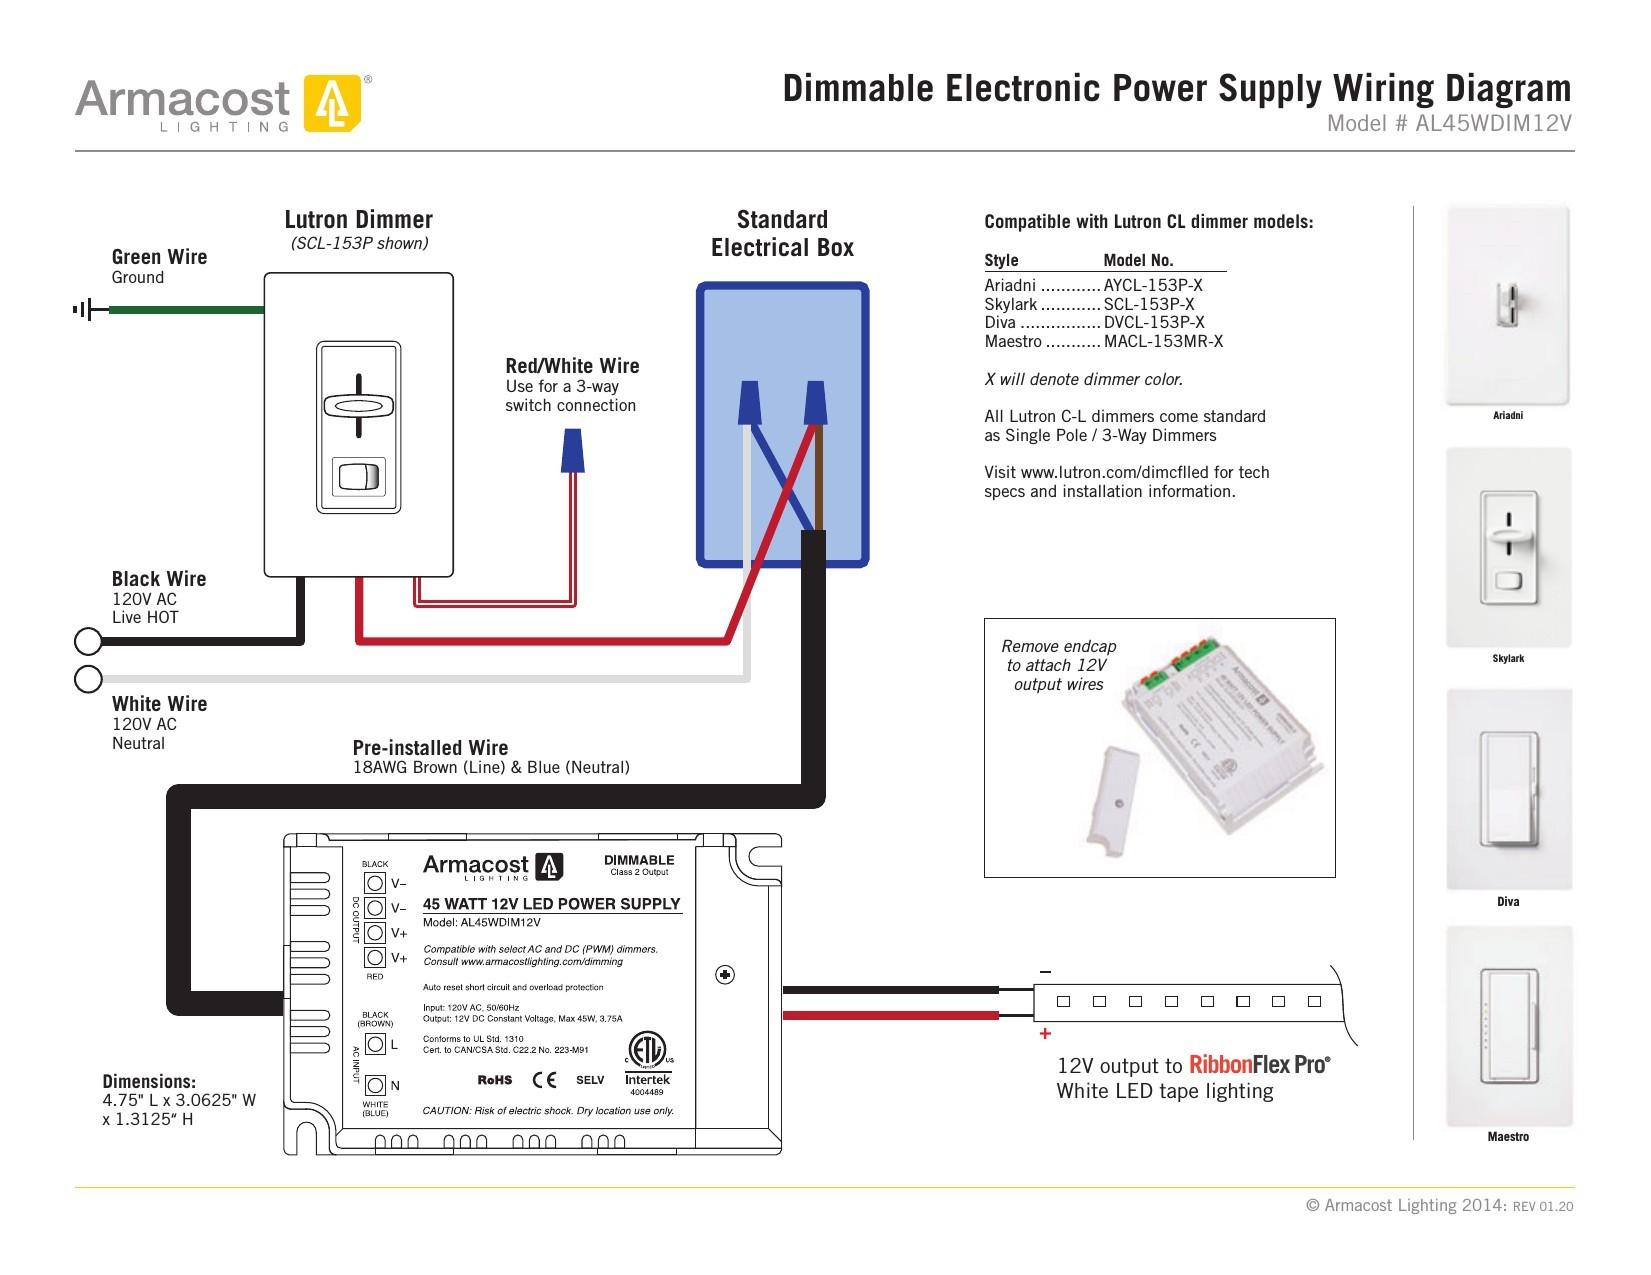 3 Way Dimmer Switch Wiring Diagram Unique Dimmer Switch Wiring Diagram Diagram Of 3 Way Dimmer Switch Wiring Diagram